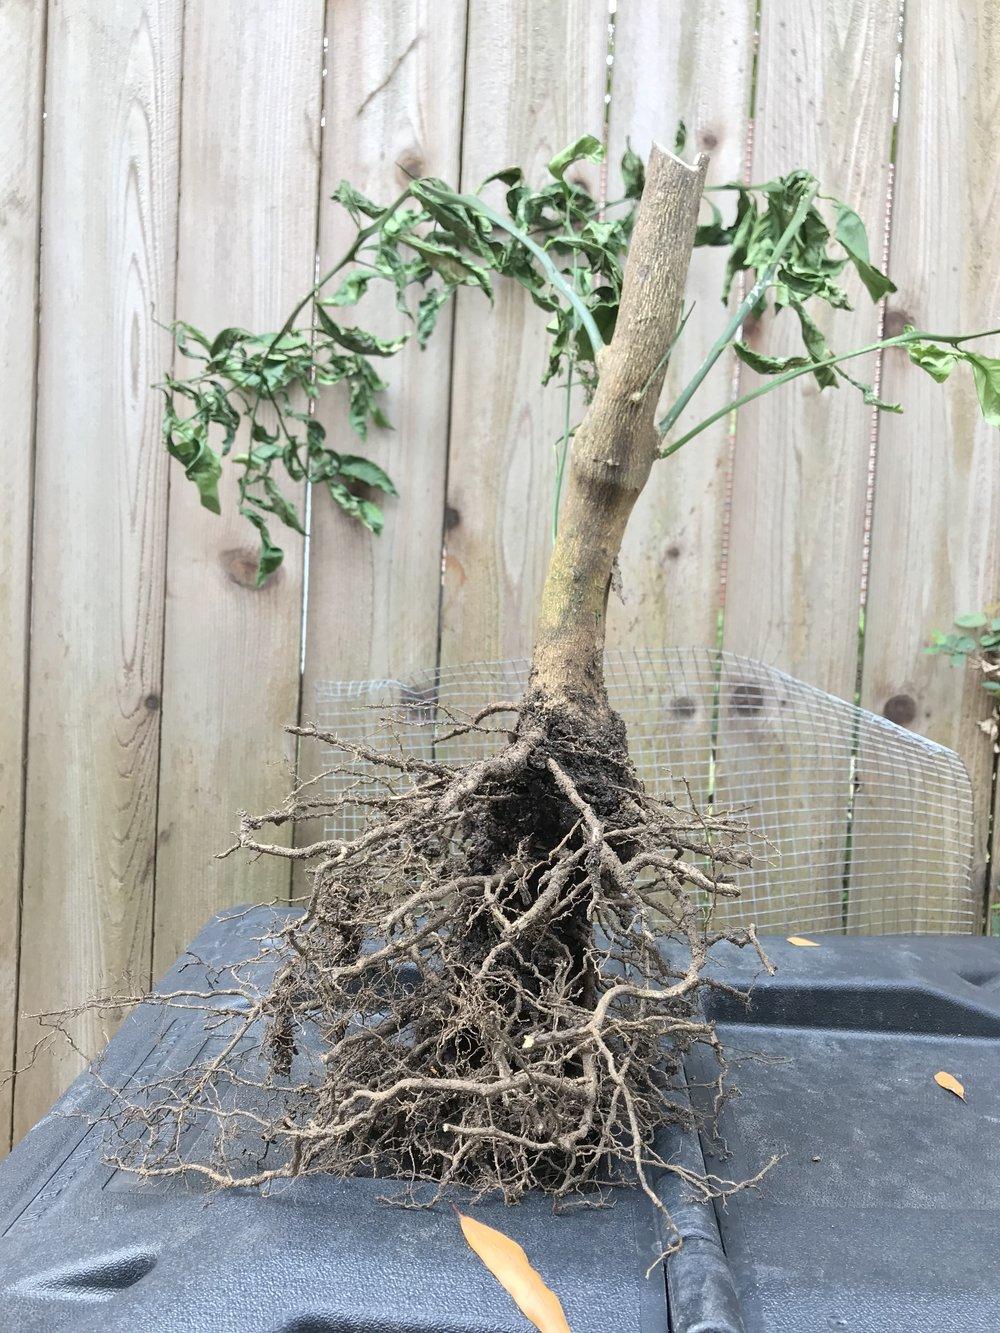 What is left of my diseased tree.